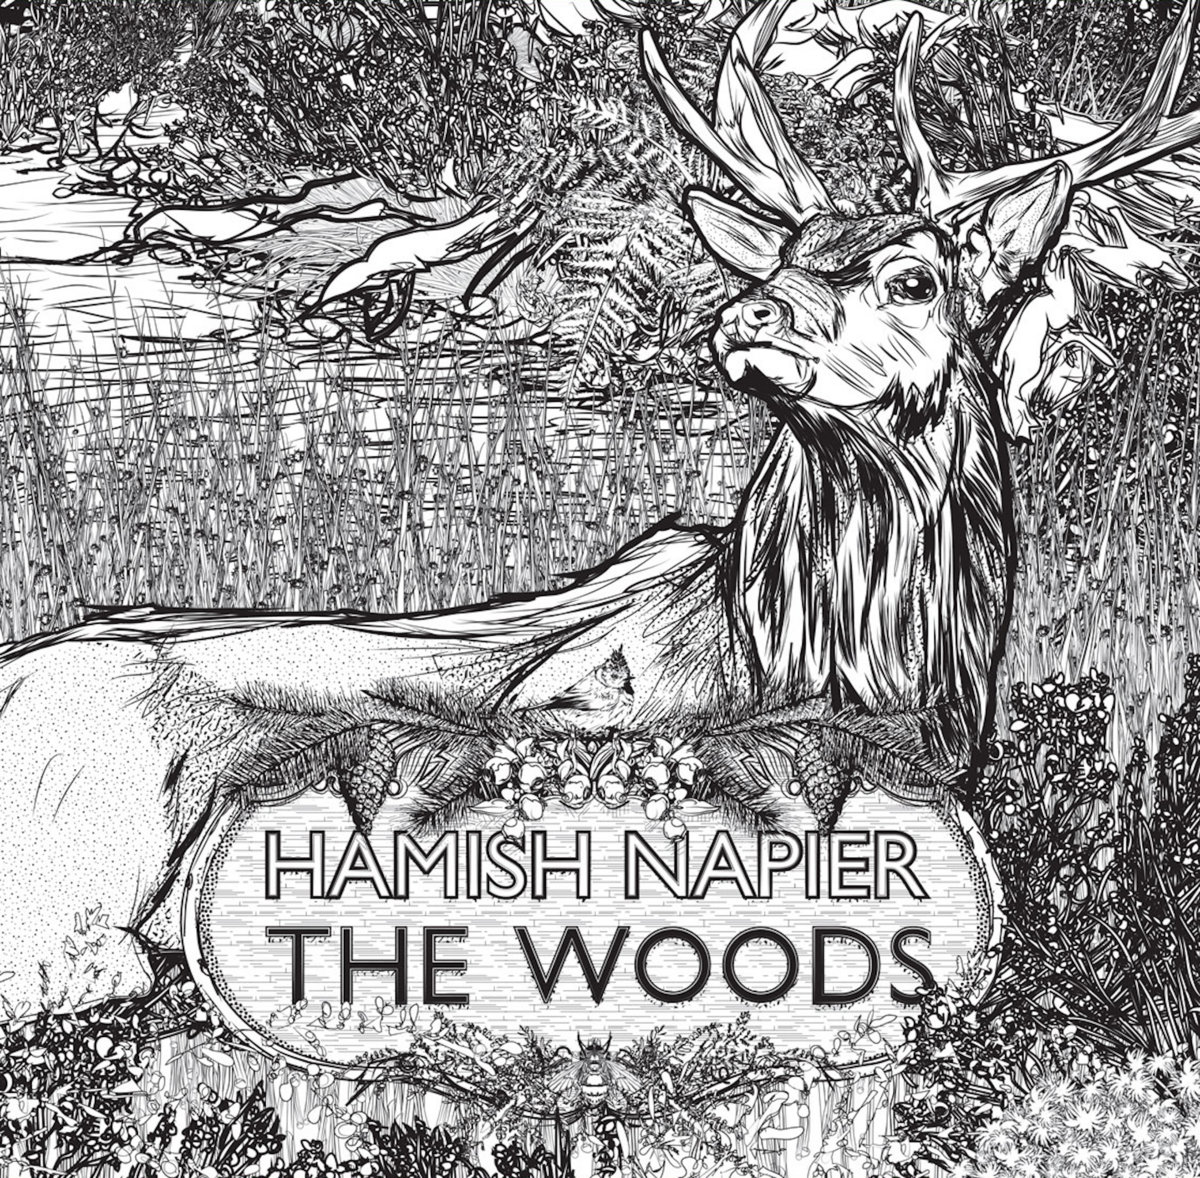 Hamish Napier - The Woods